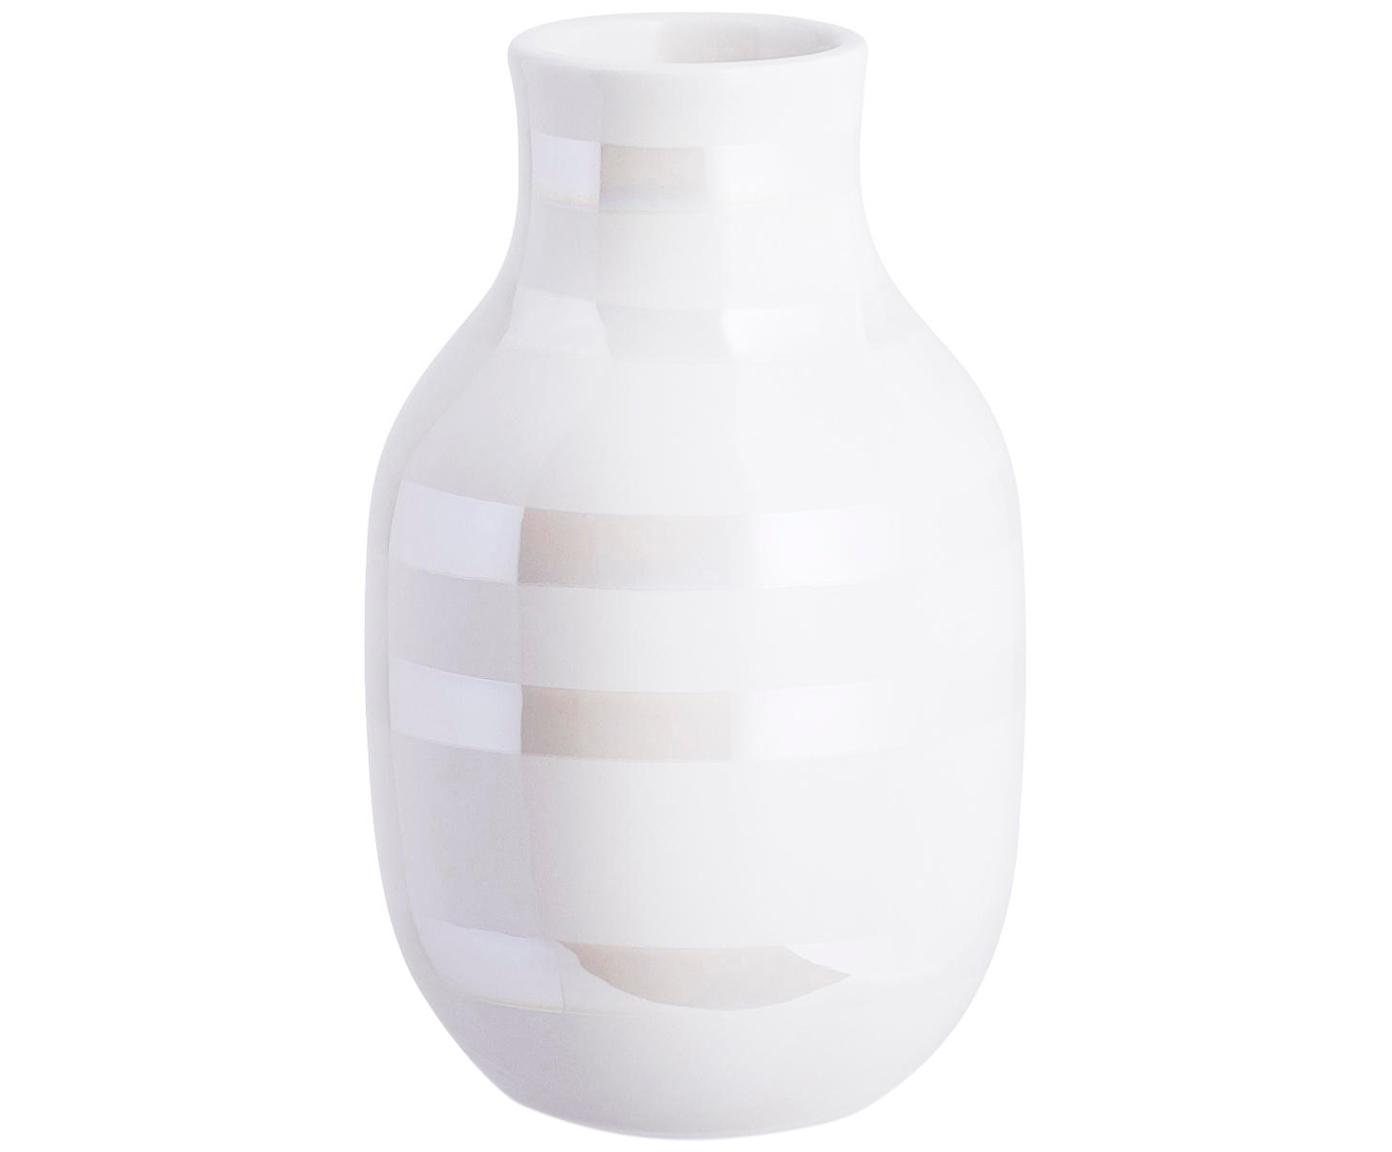 Handgemaakte design vaas Omaggio, klein, Keramiek, Wit, parelmoerkleurig, Ø 8 x H 13 cm